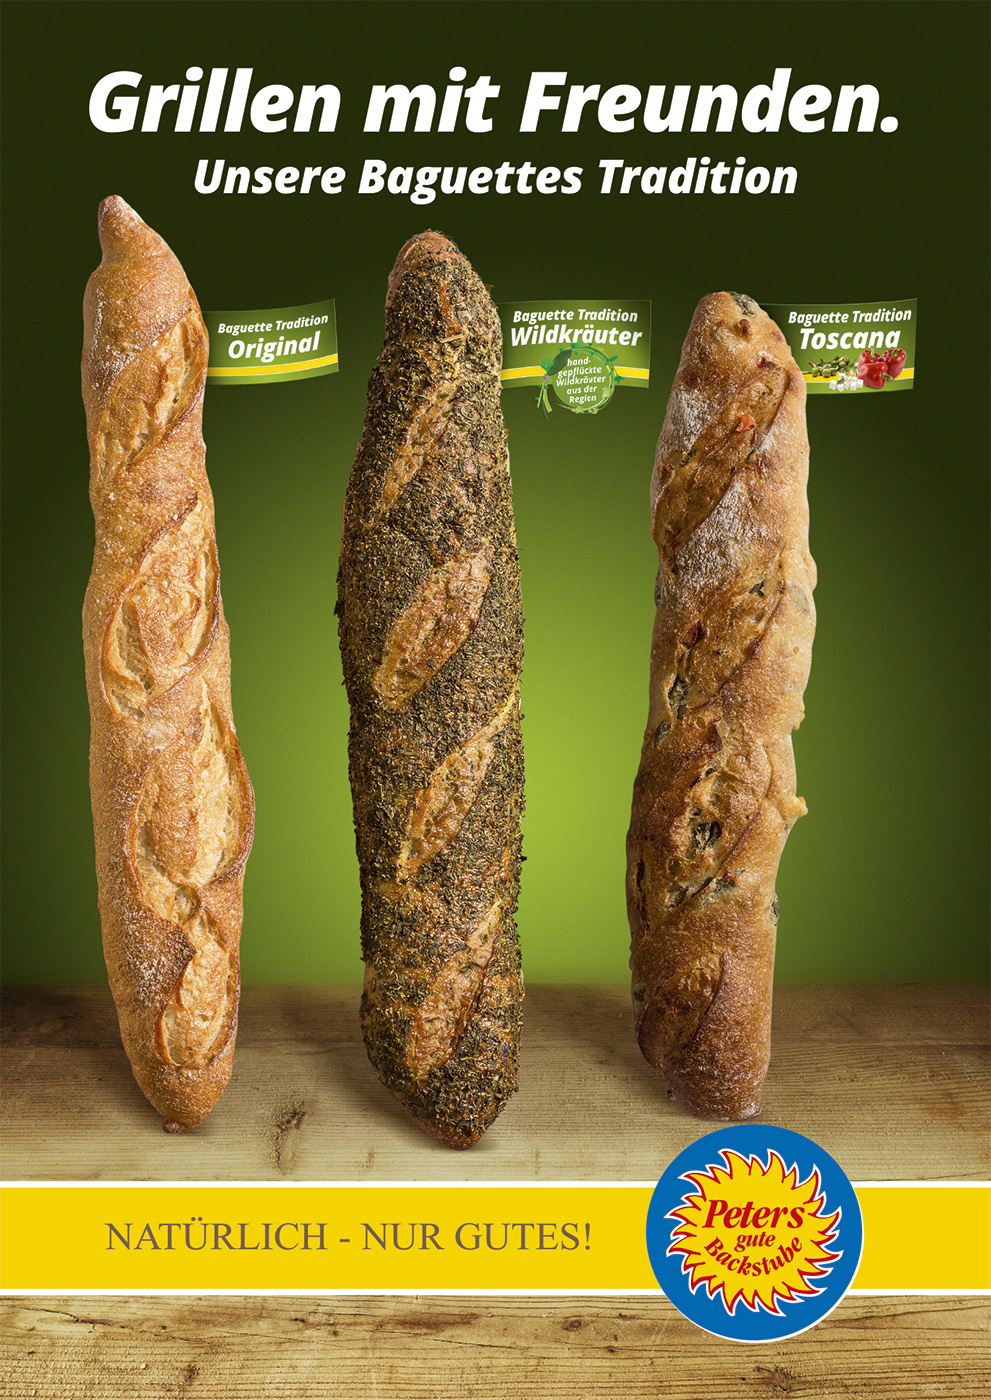 Peters gute Backstube   Plakat Baguette Tradition